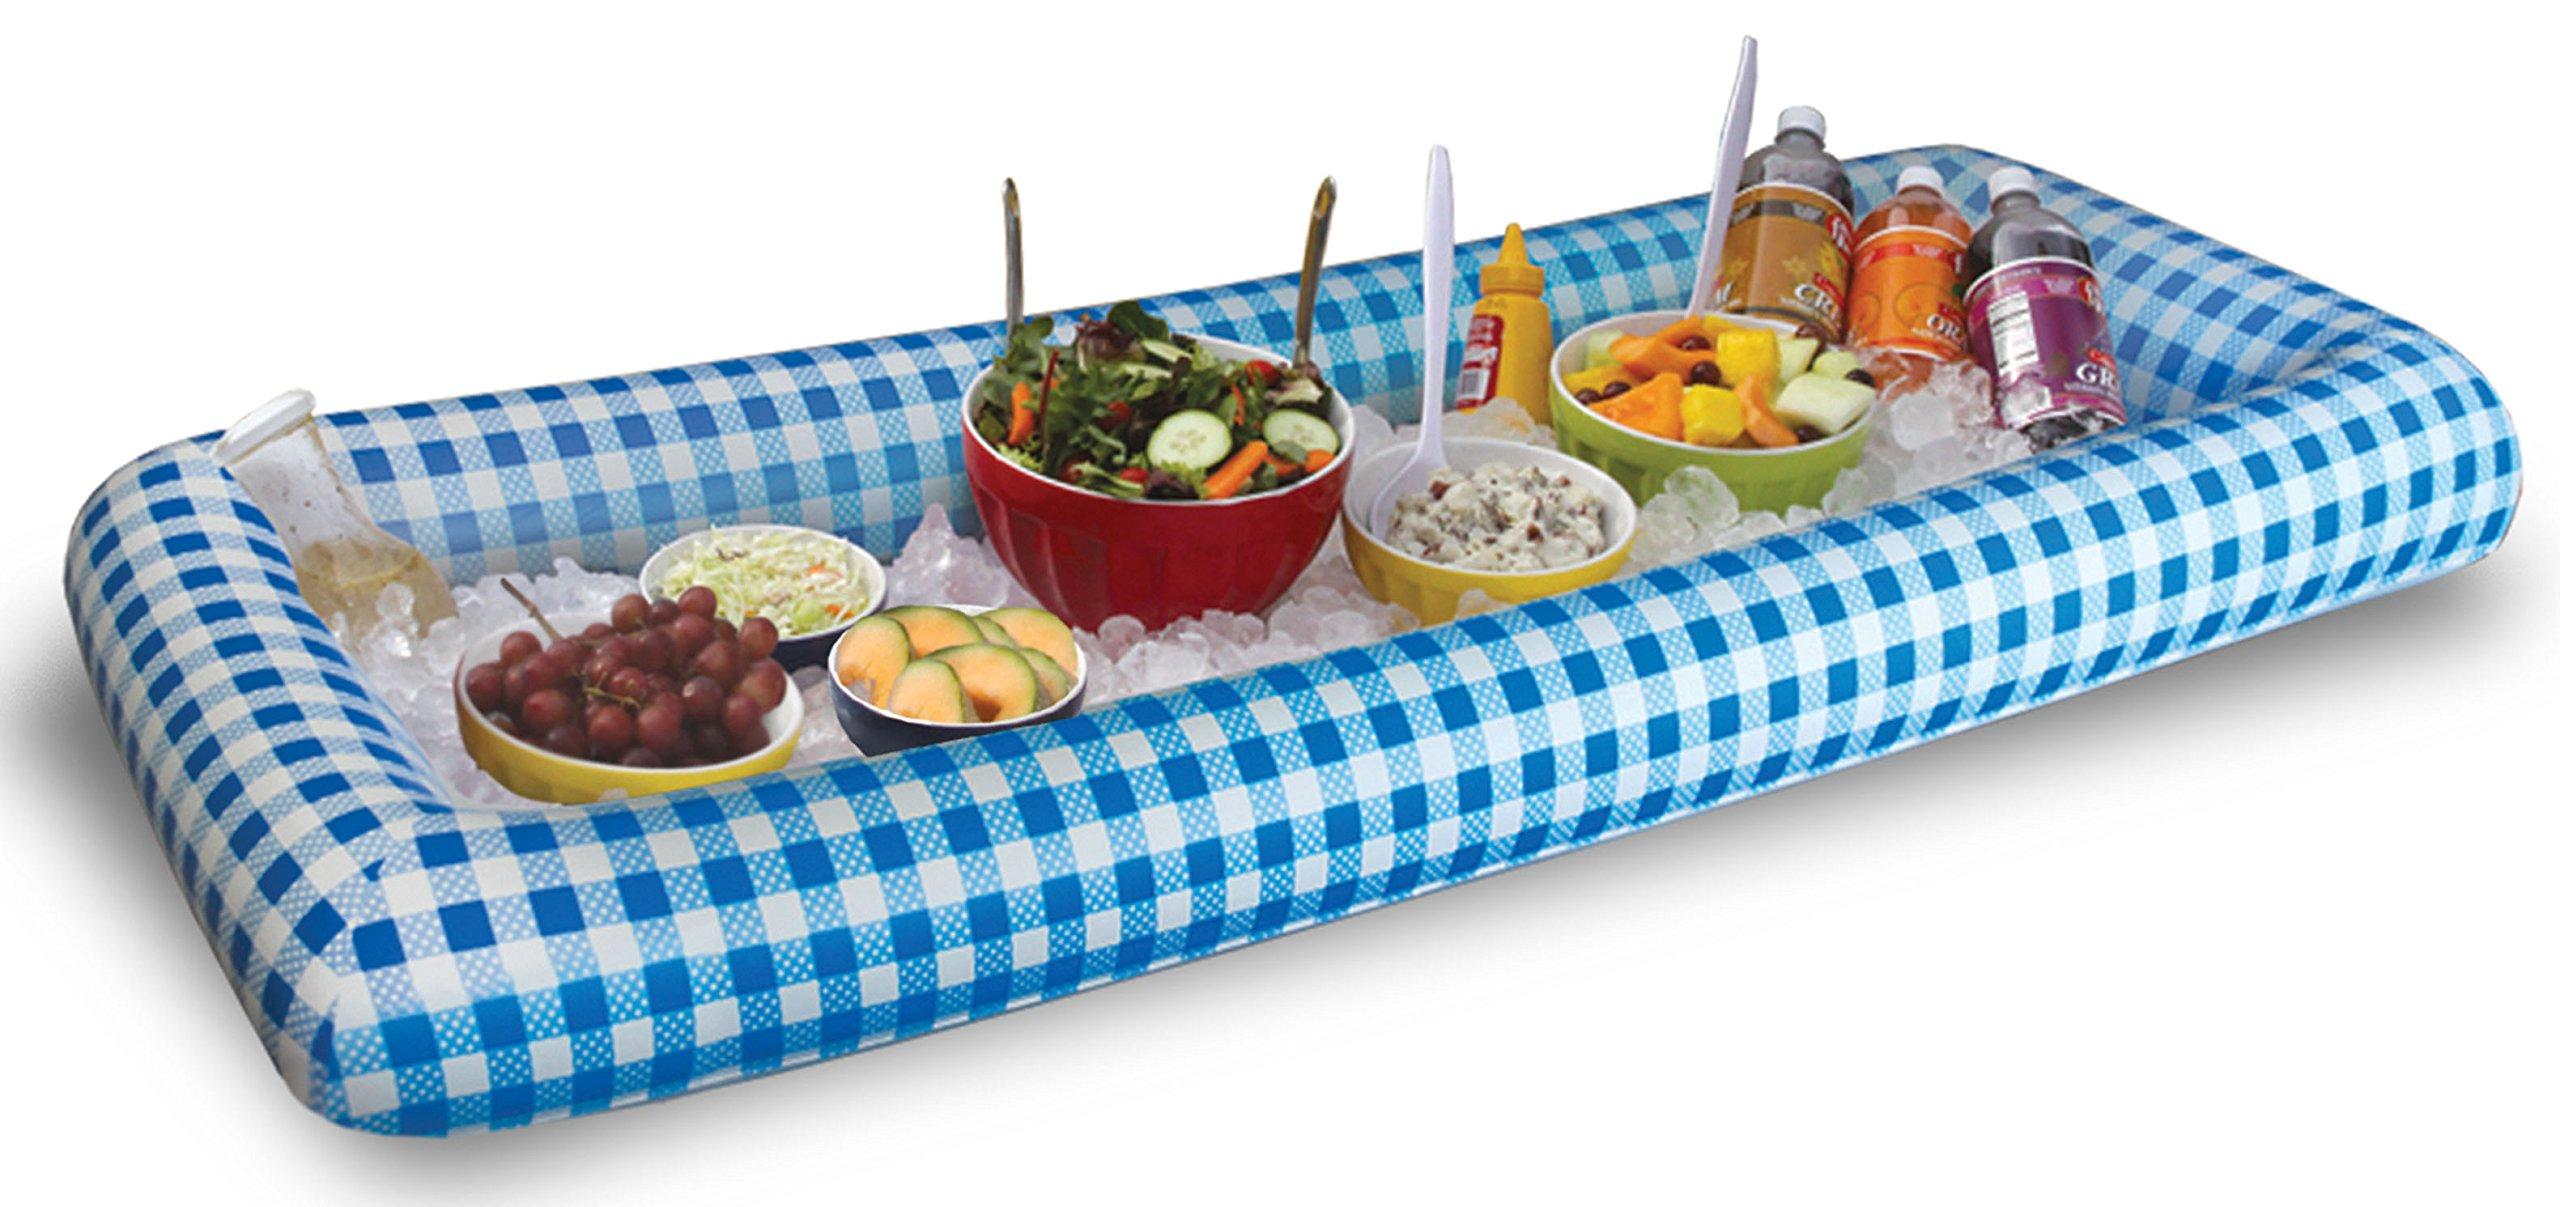 BW Brands Inflatabuffet, Blue Picnic